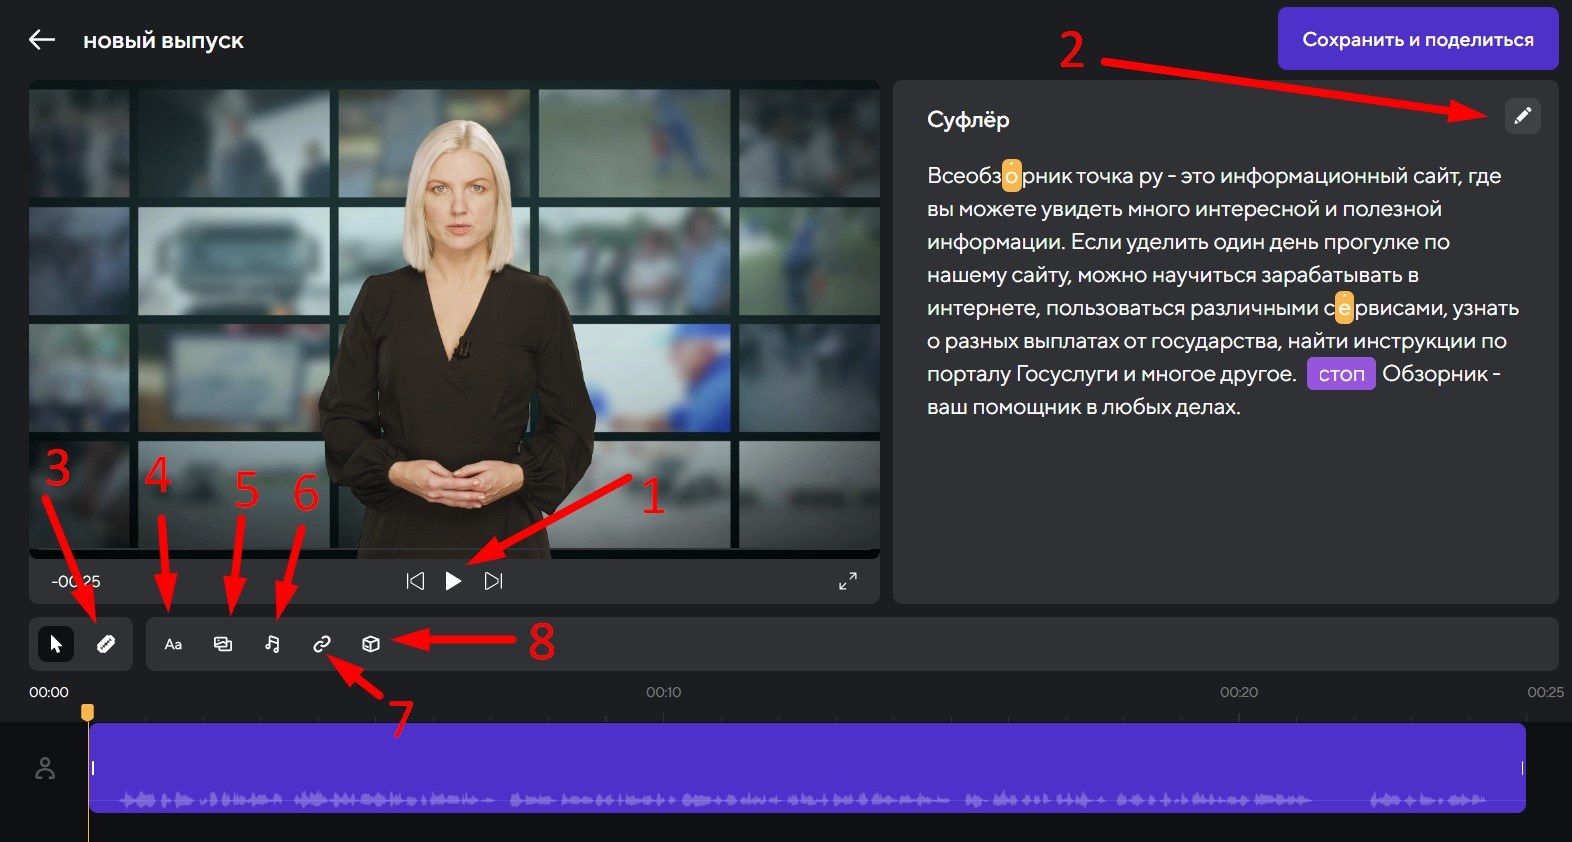 kak-sozdat-video-na-diktor-mail-ru